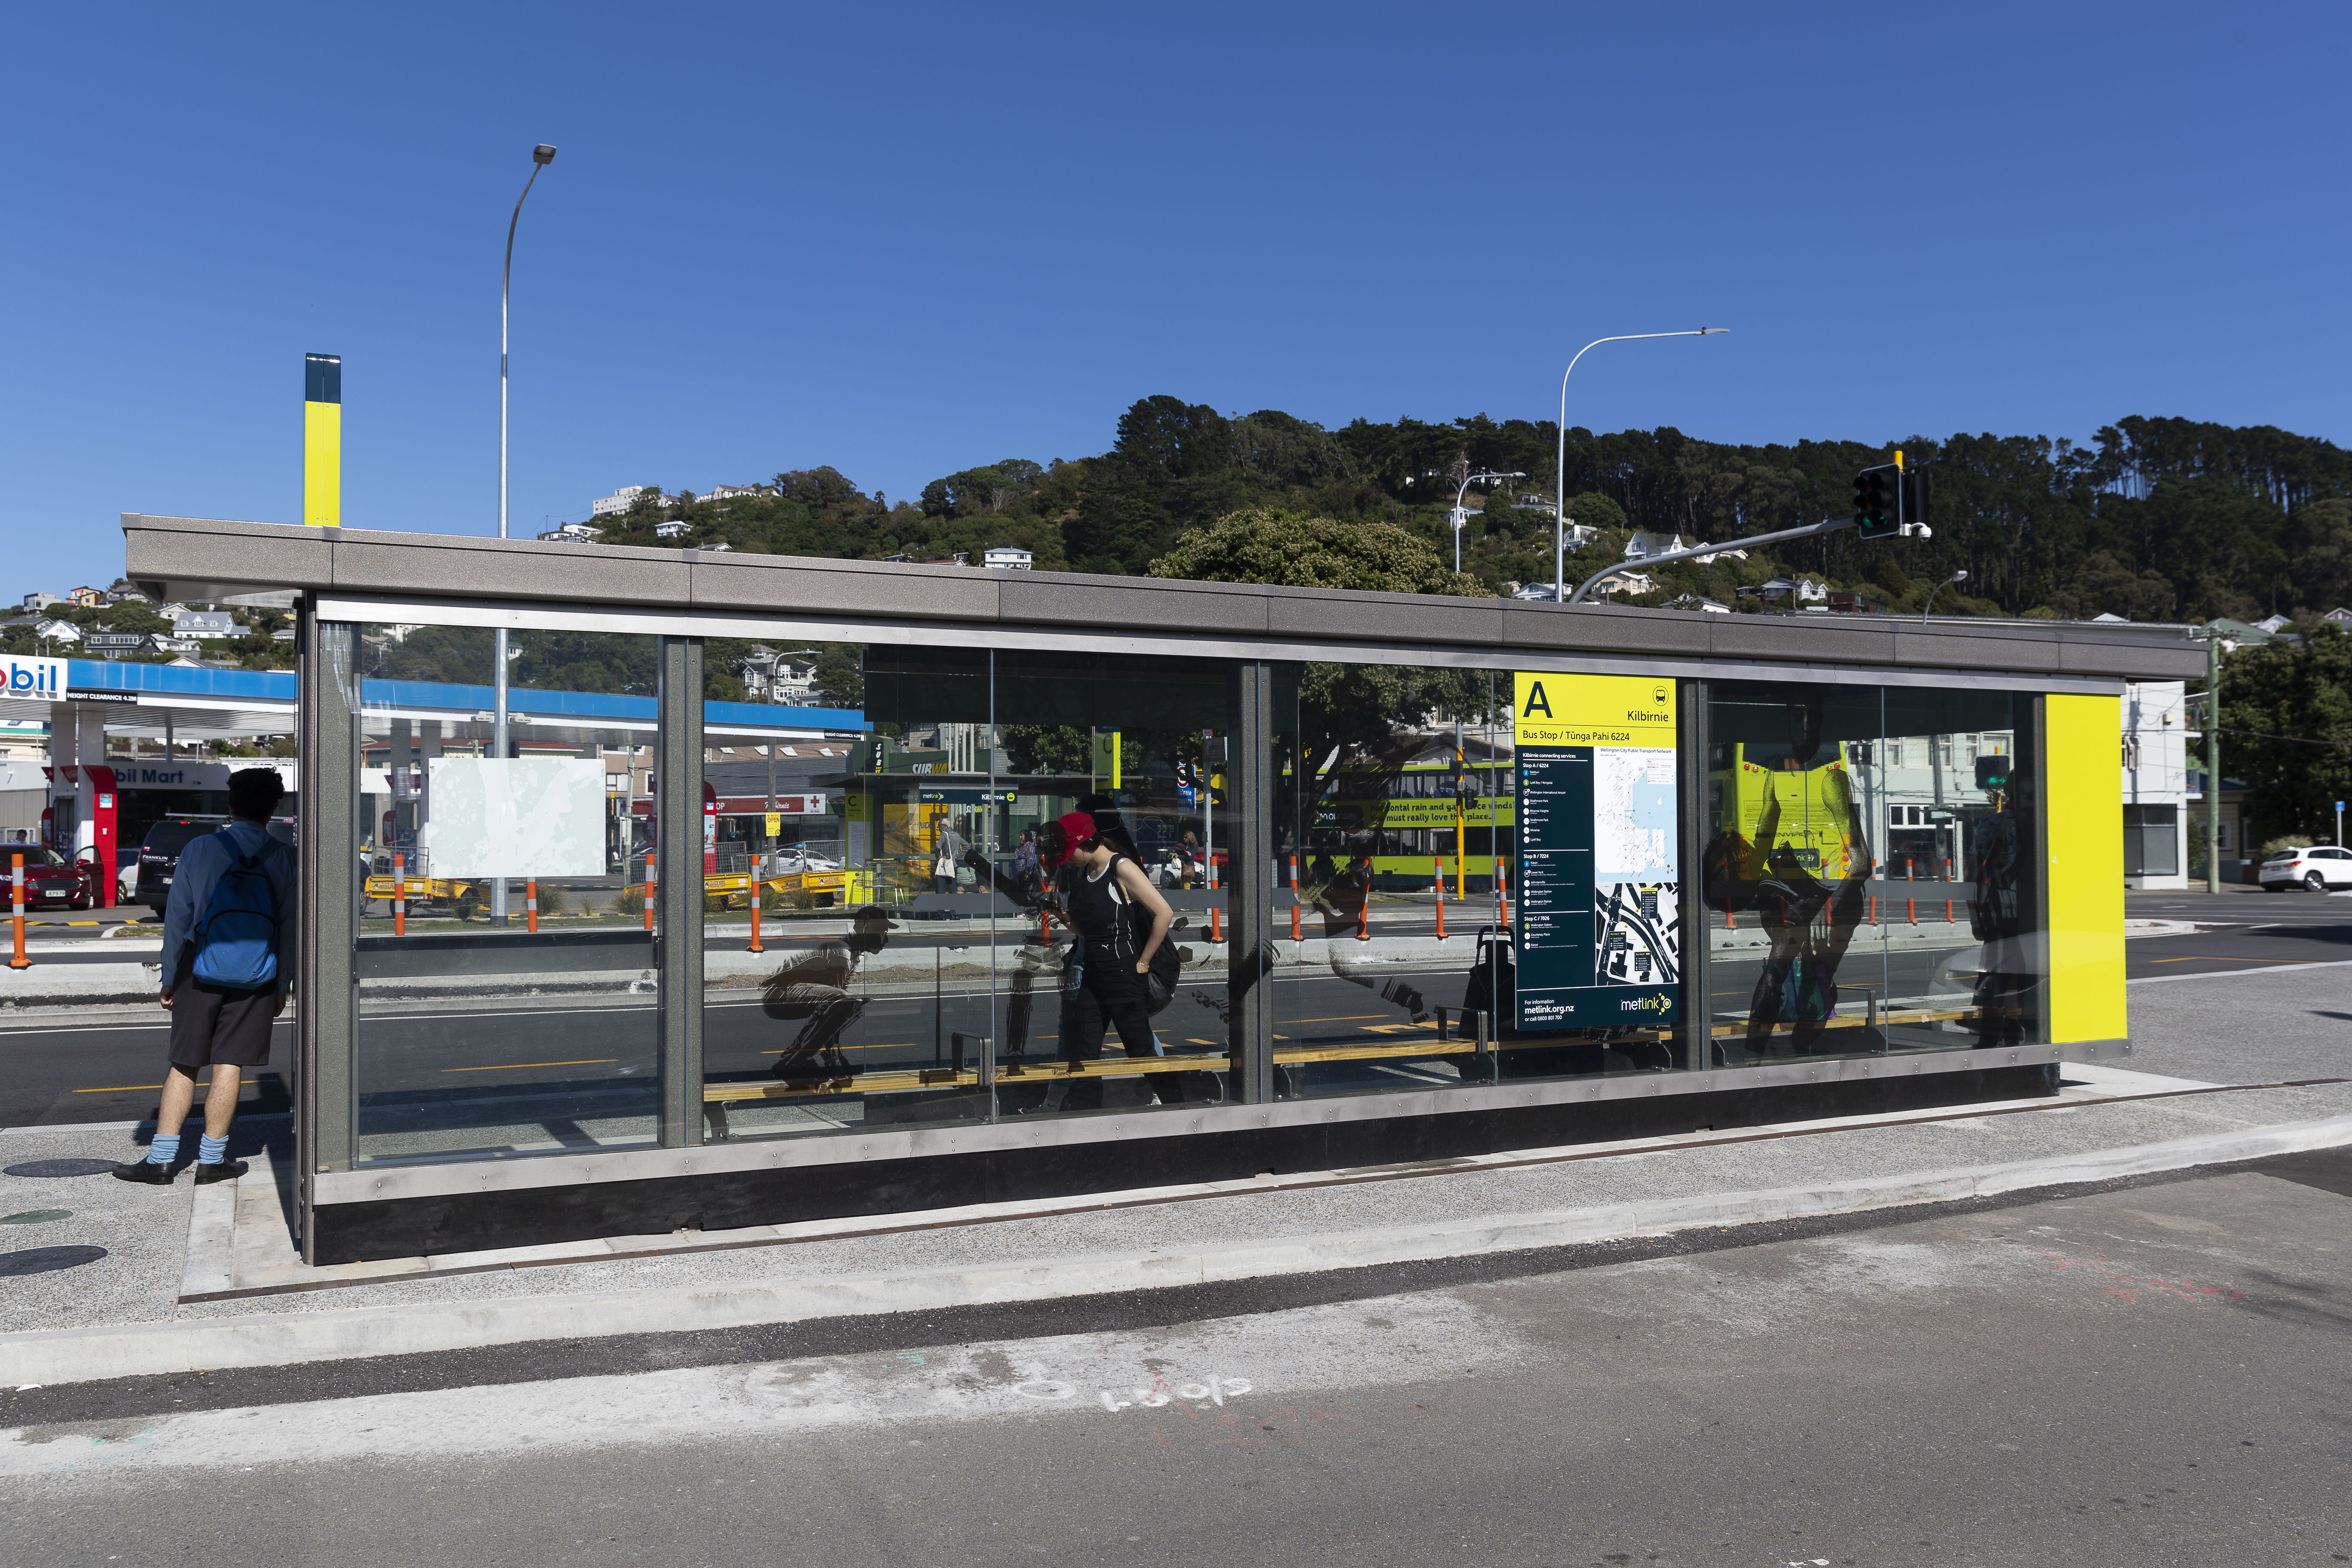 Bus shelter j007849 21i0184